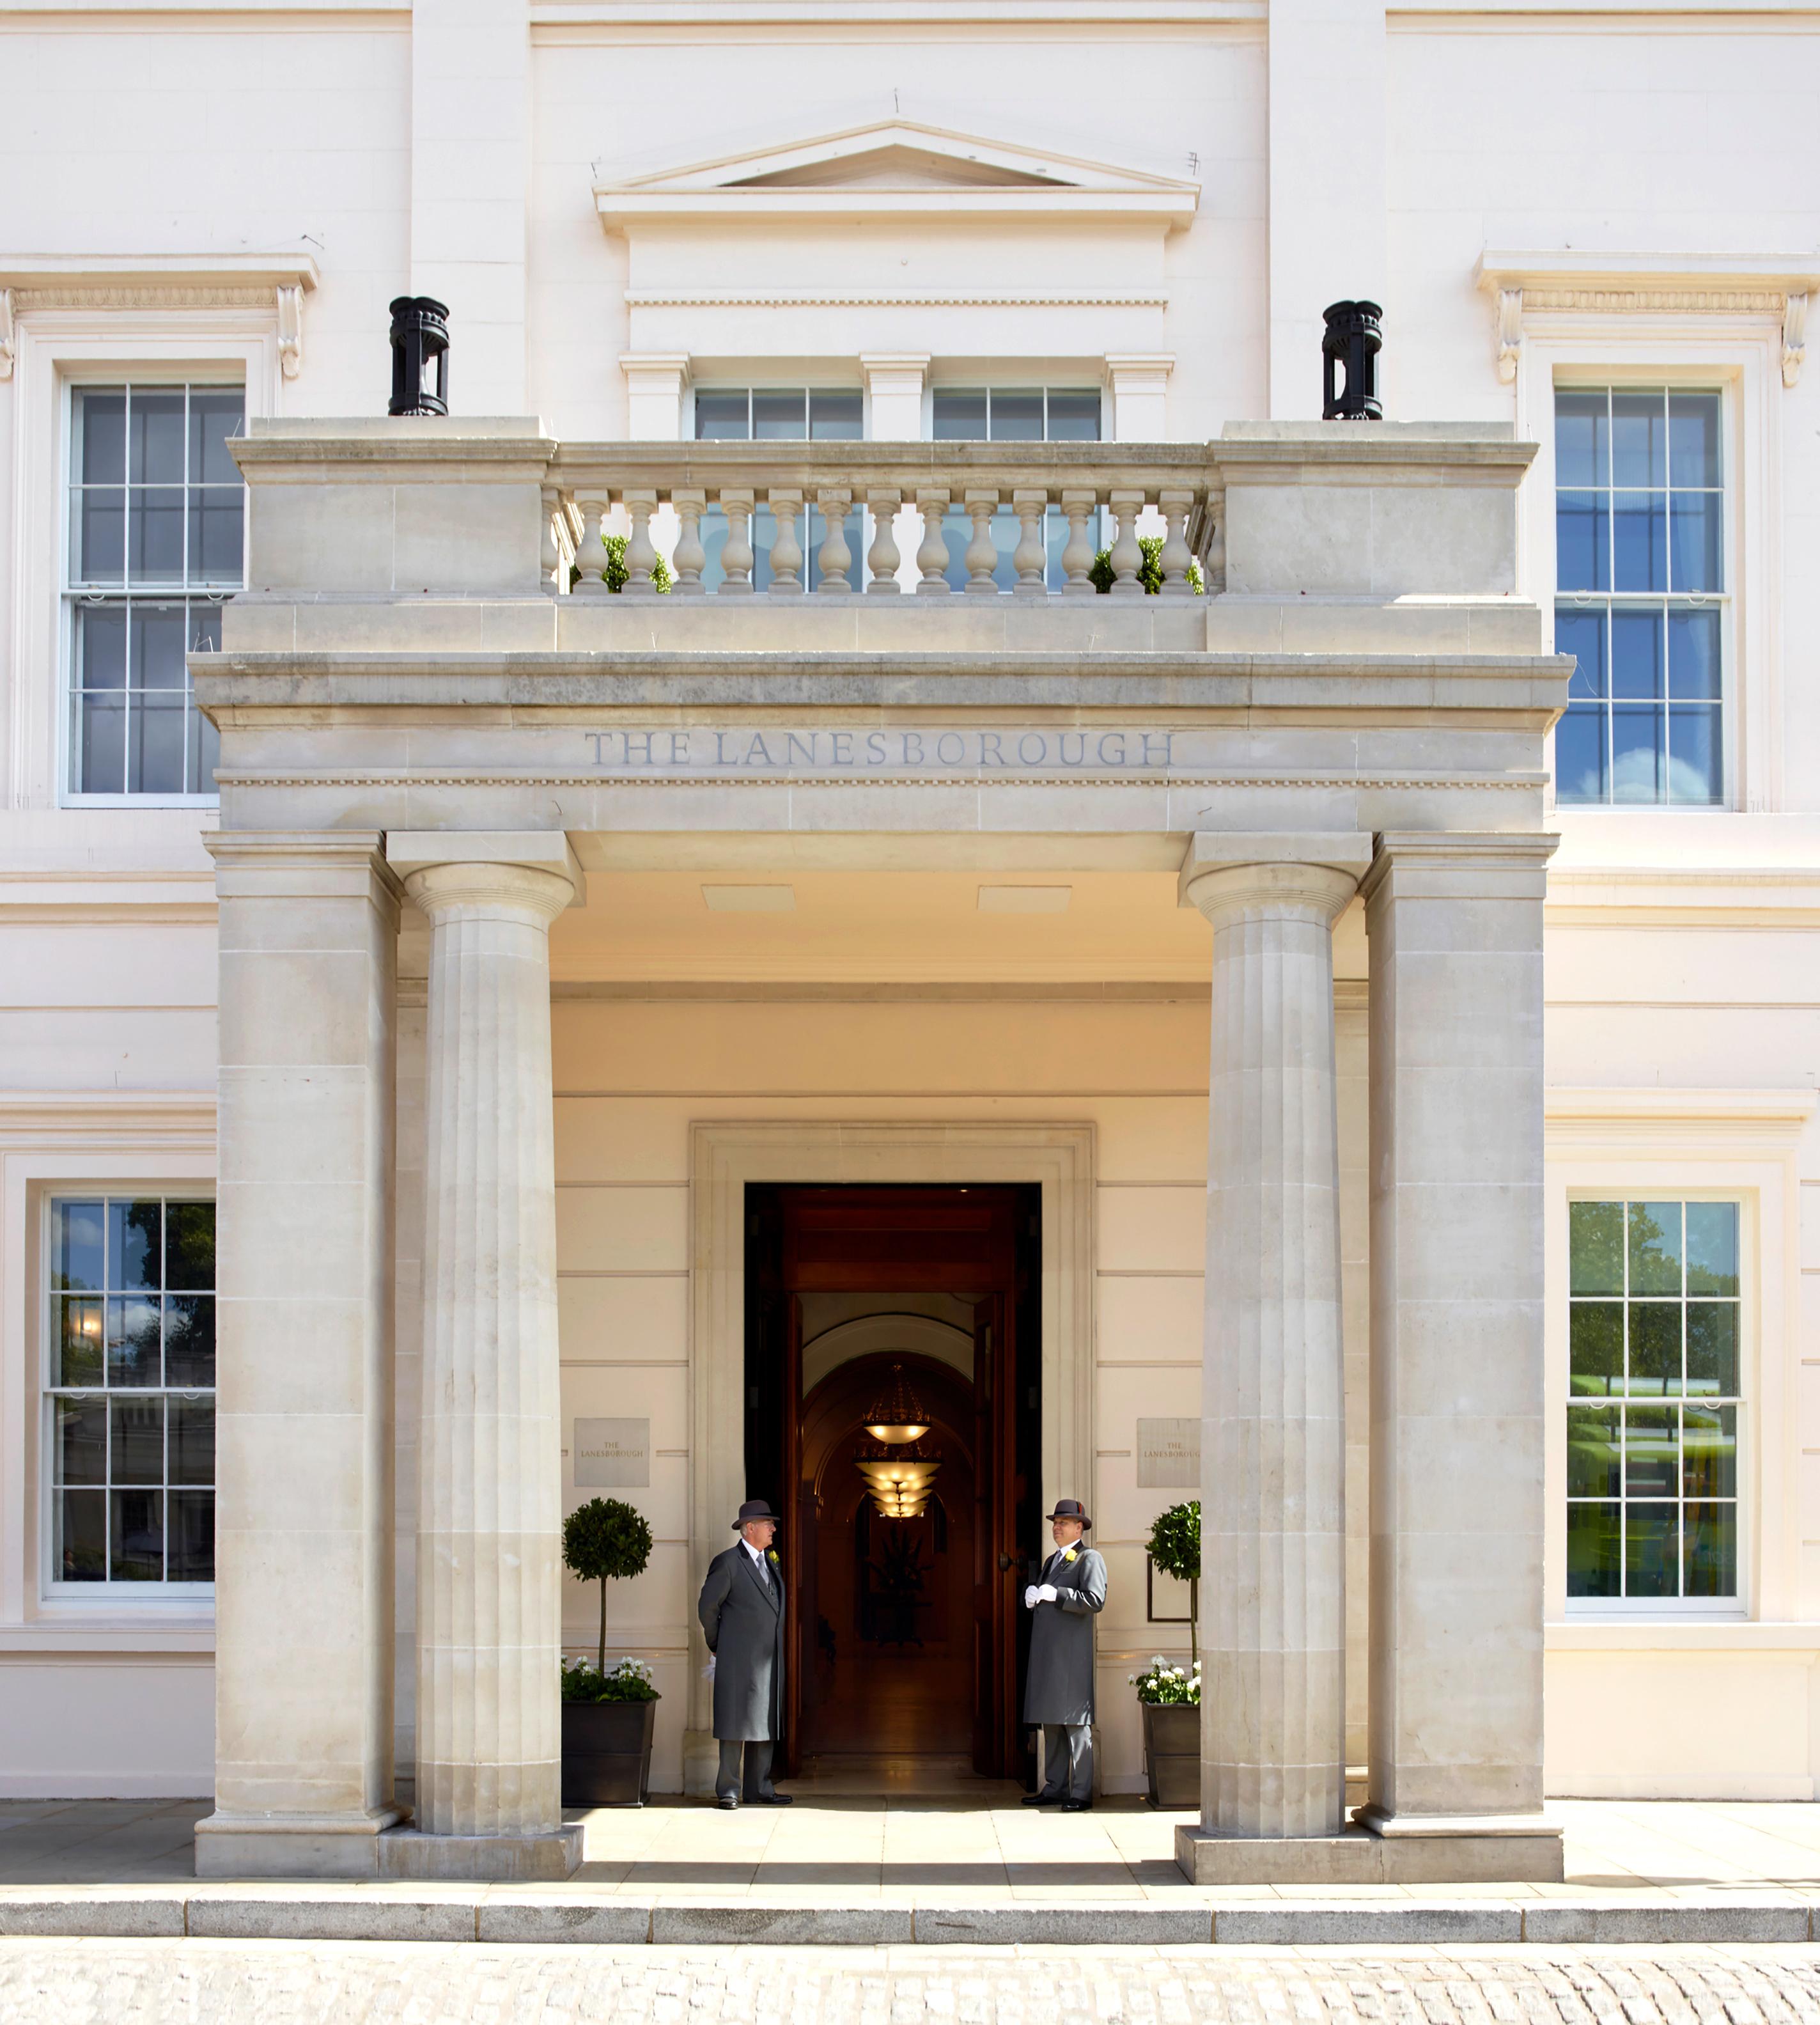 Uncover the secrets of London's refurbished Lanesborough Hotel